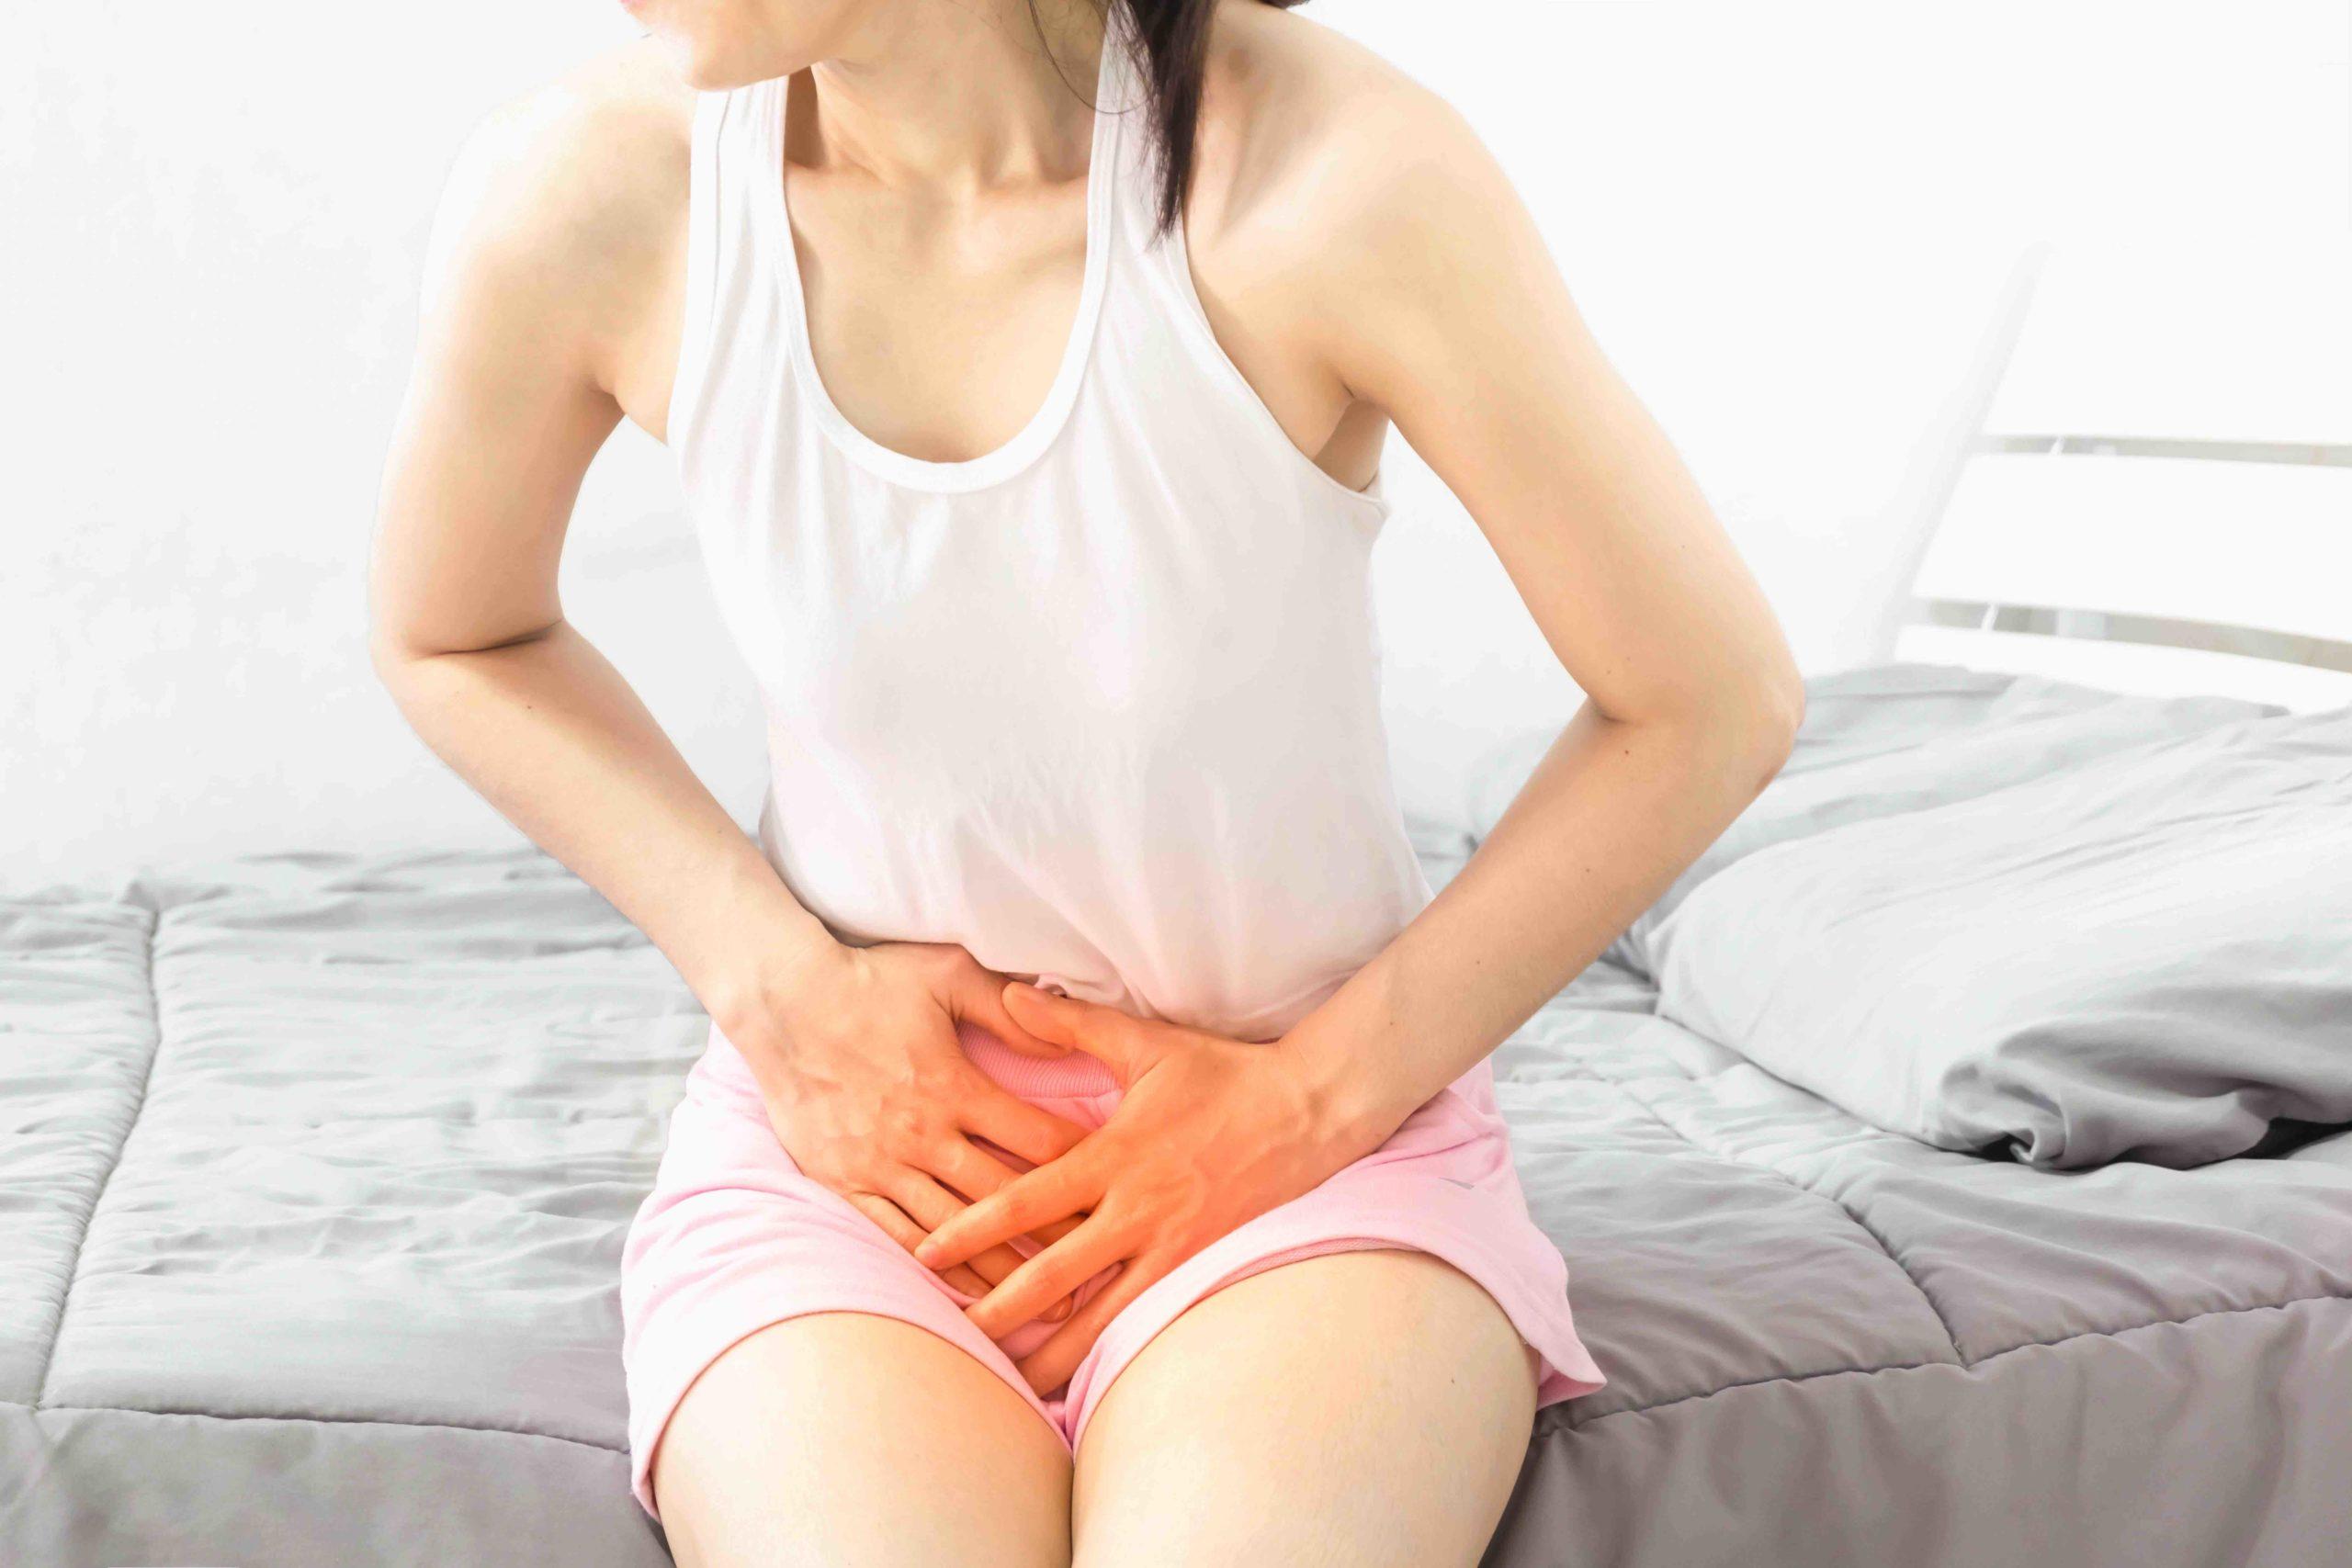 Les infections urinaires en 10 questions